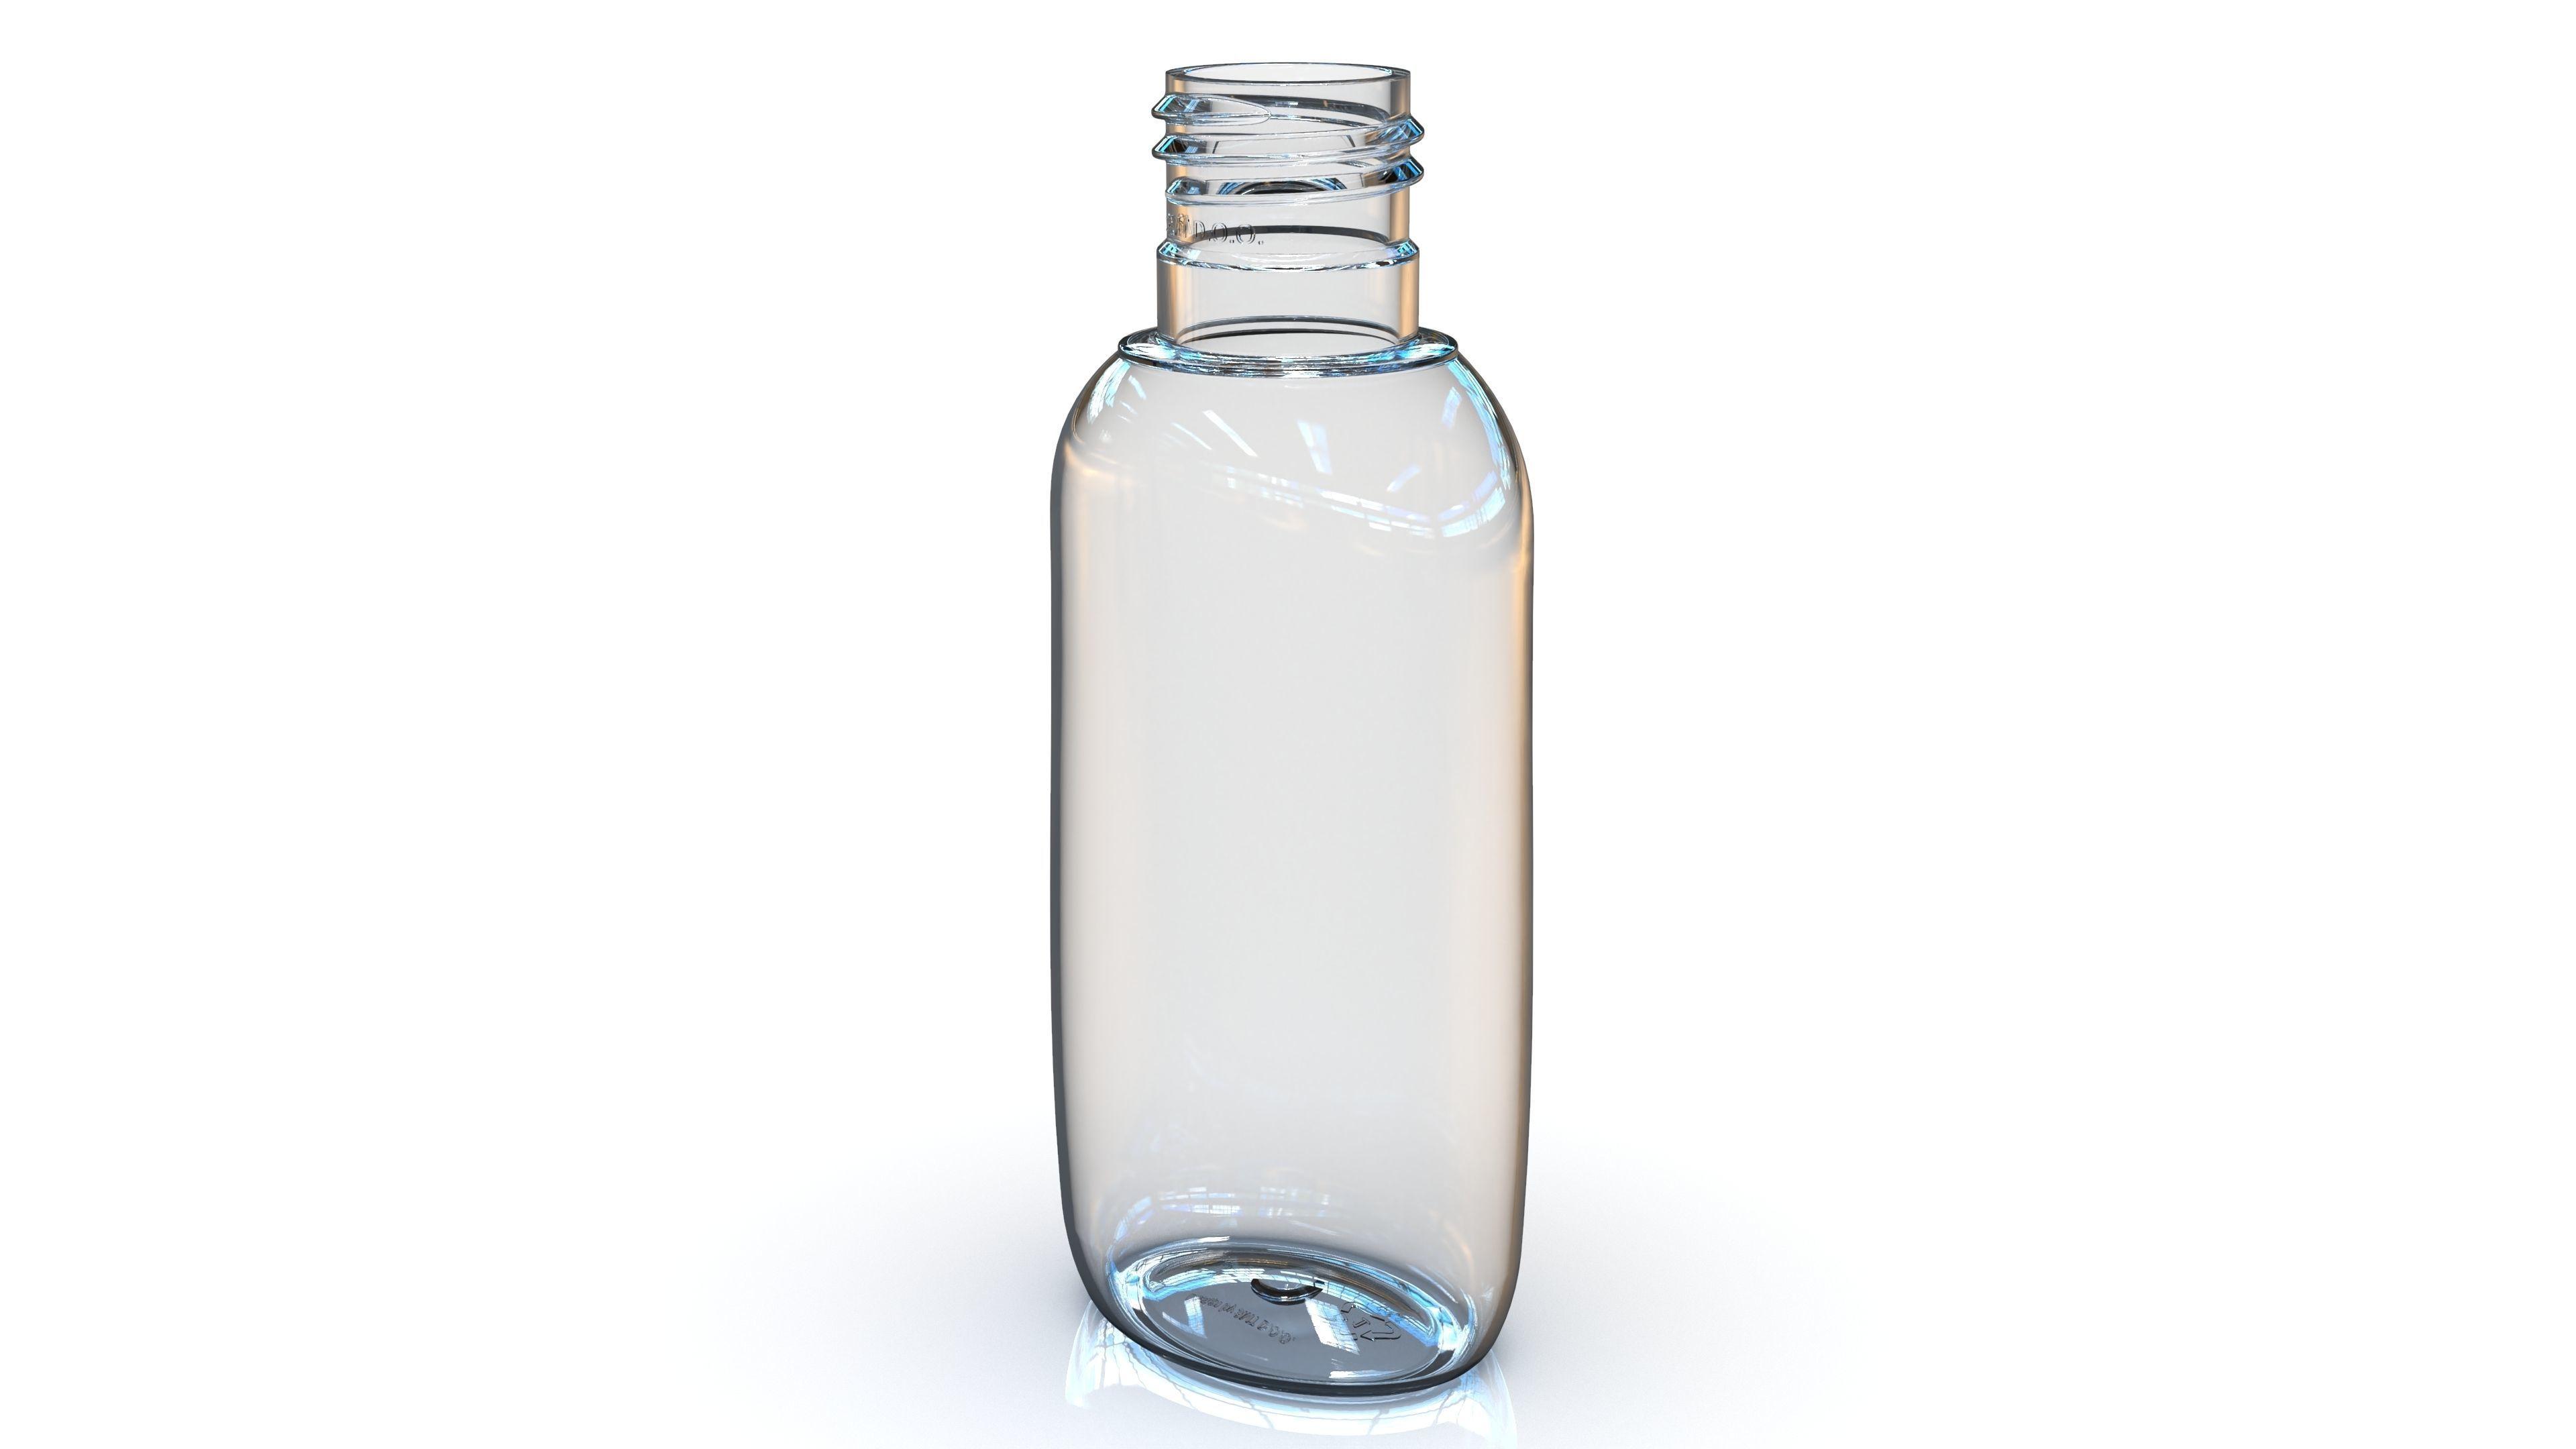 PET Bottle SP - 415 - 15 - M 25 mL - for water - drinks - etc